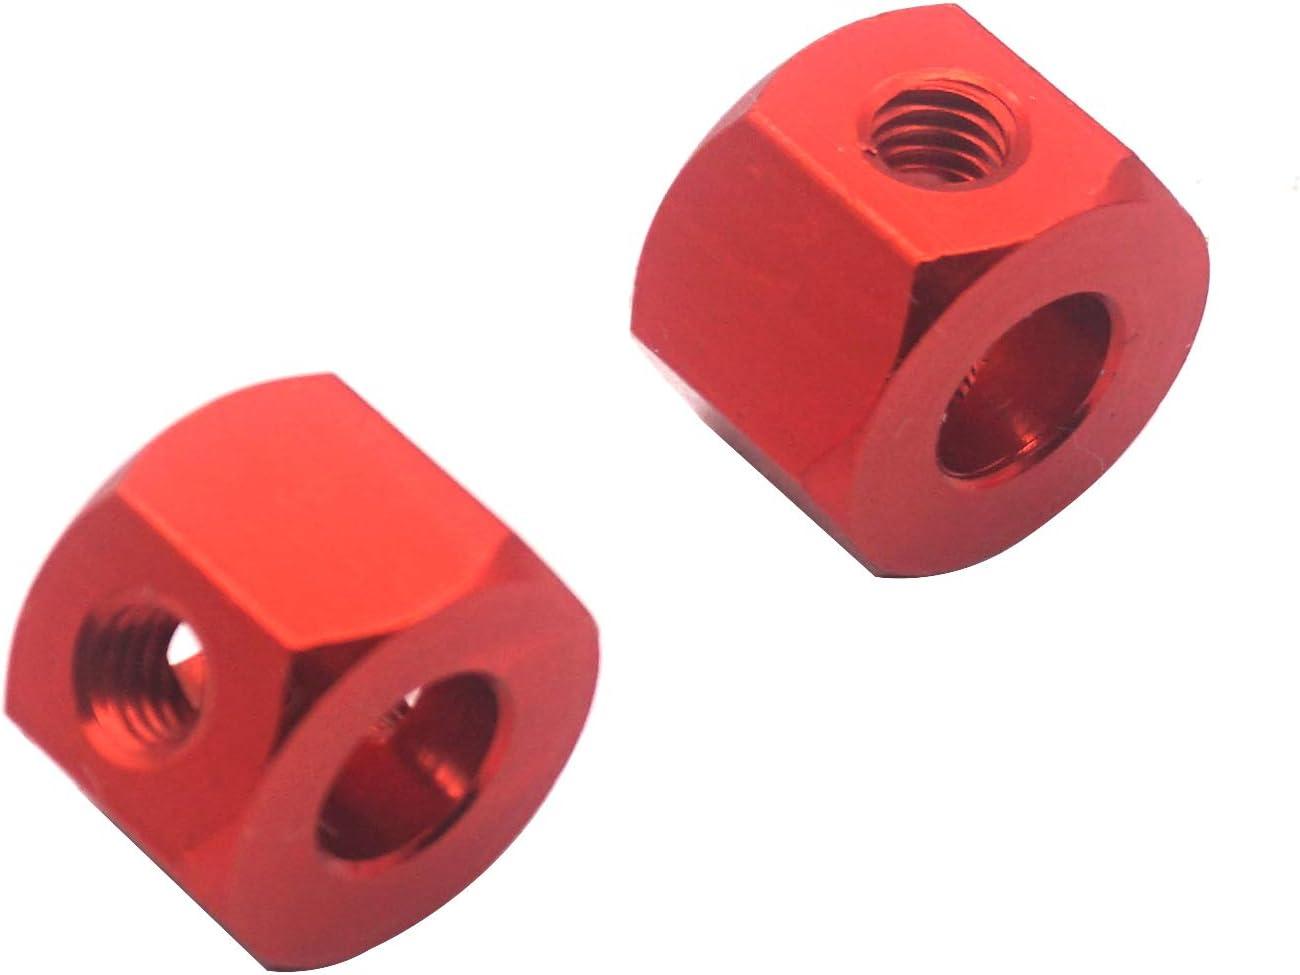 Mirthobby 4Pack 12mm Metal Wheel Hex Hub Adapter Connector for WPL B14K C-14 C-24 1//16 MN-D90 MN-D90K MN45 MN99 1//12 RC Car Truck Red